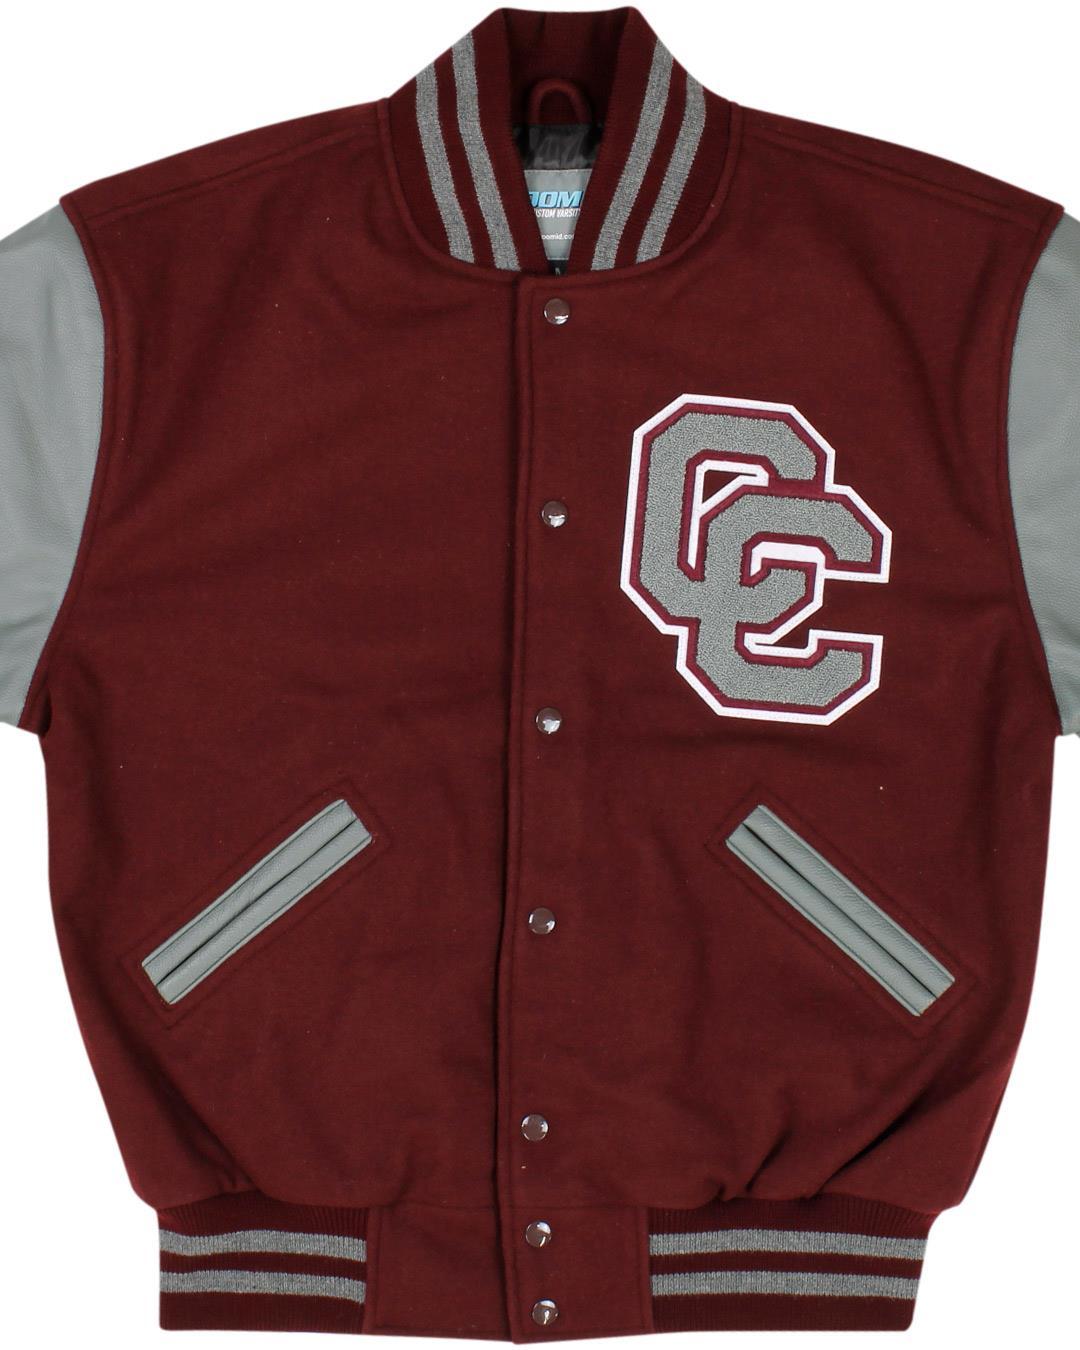 Clear Creek High School Letterman Jacket, League City TX - Front